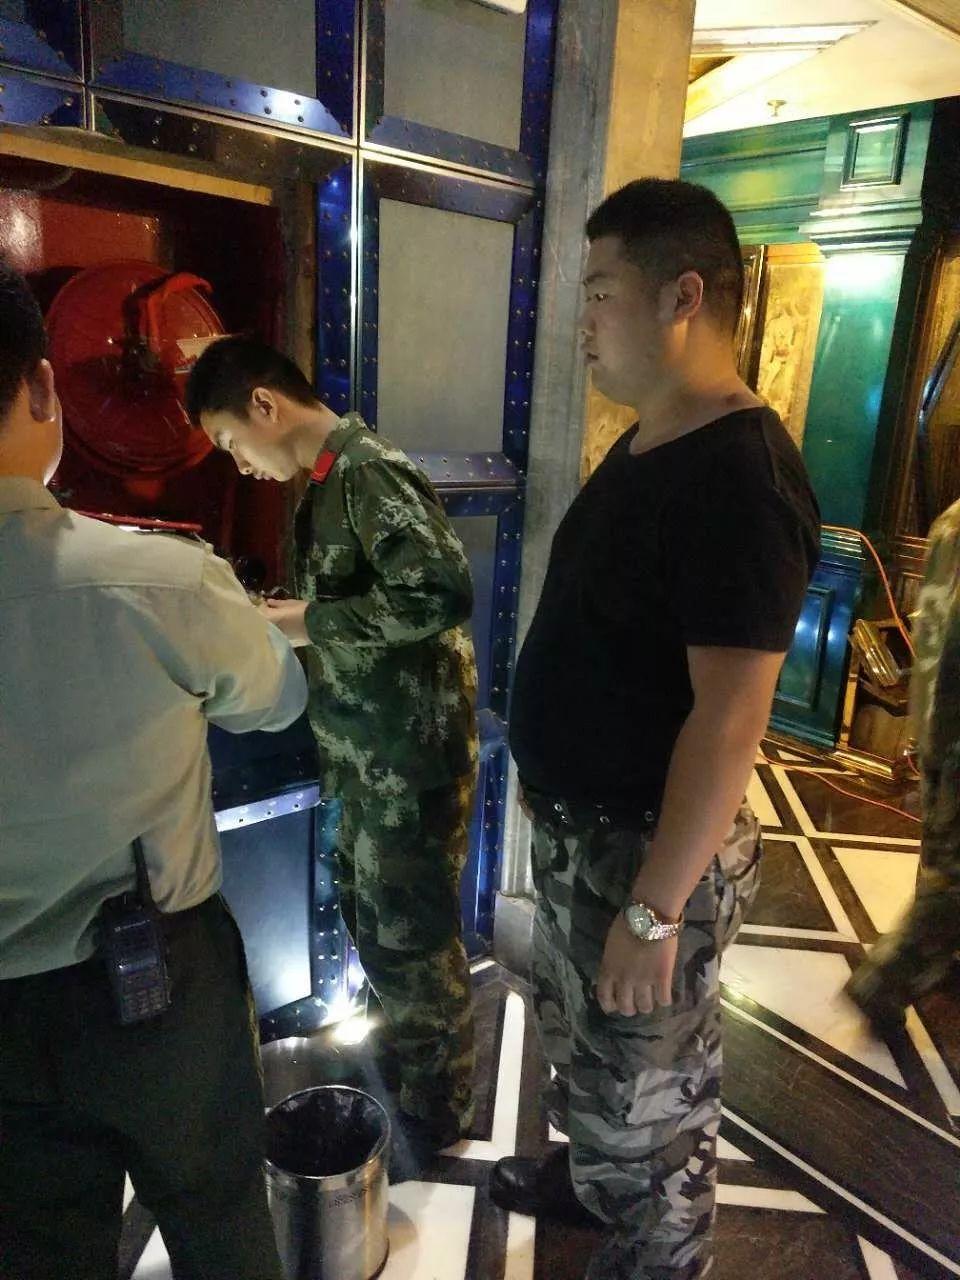 UNA CLUB丨2017.10.02#南通消防大队与UNA酒吧消防联合演习